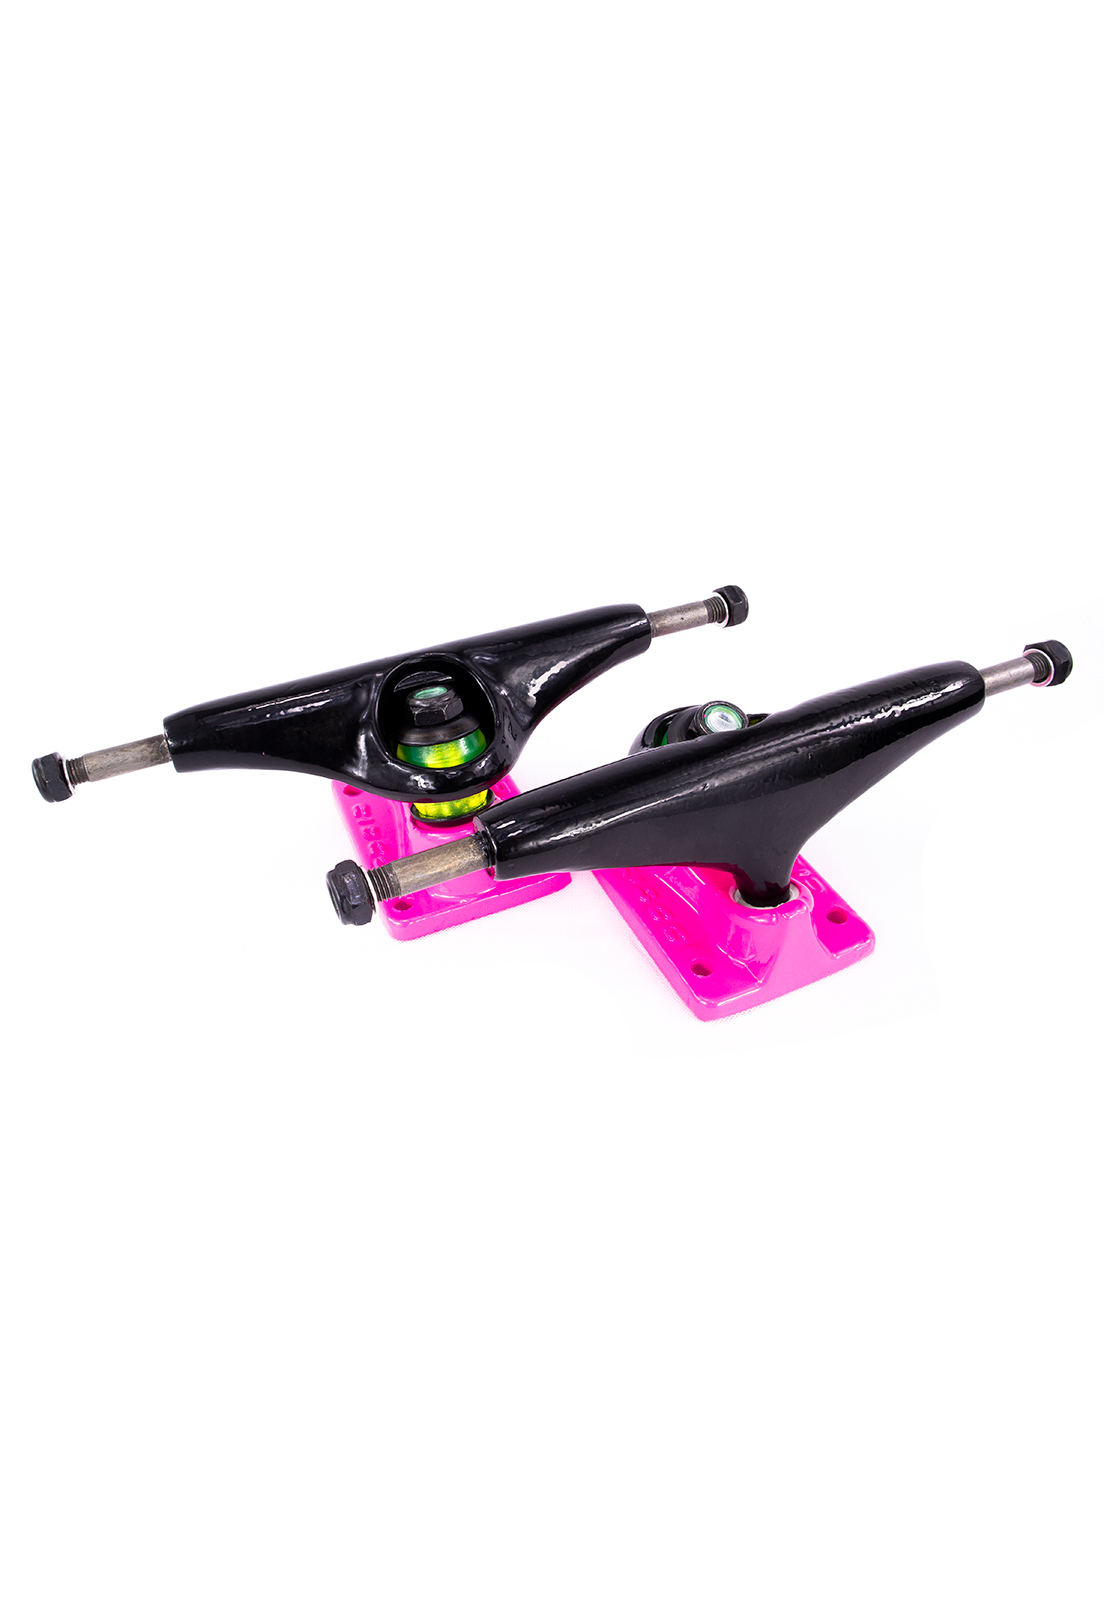 Truck Cisco Skate 139mm Black/Pink